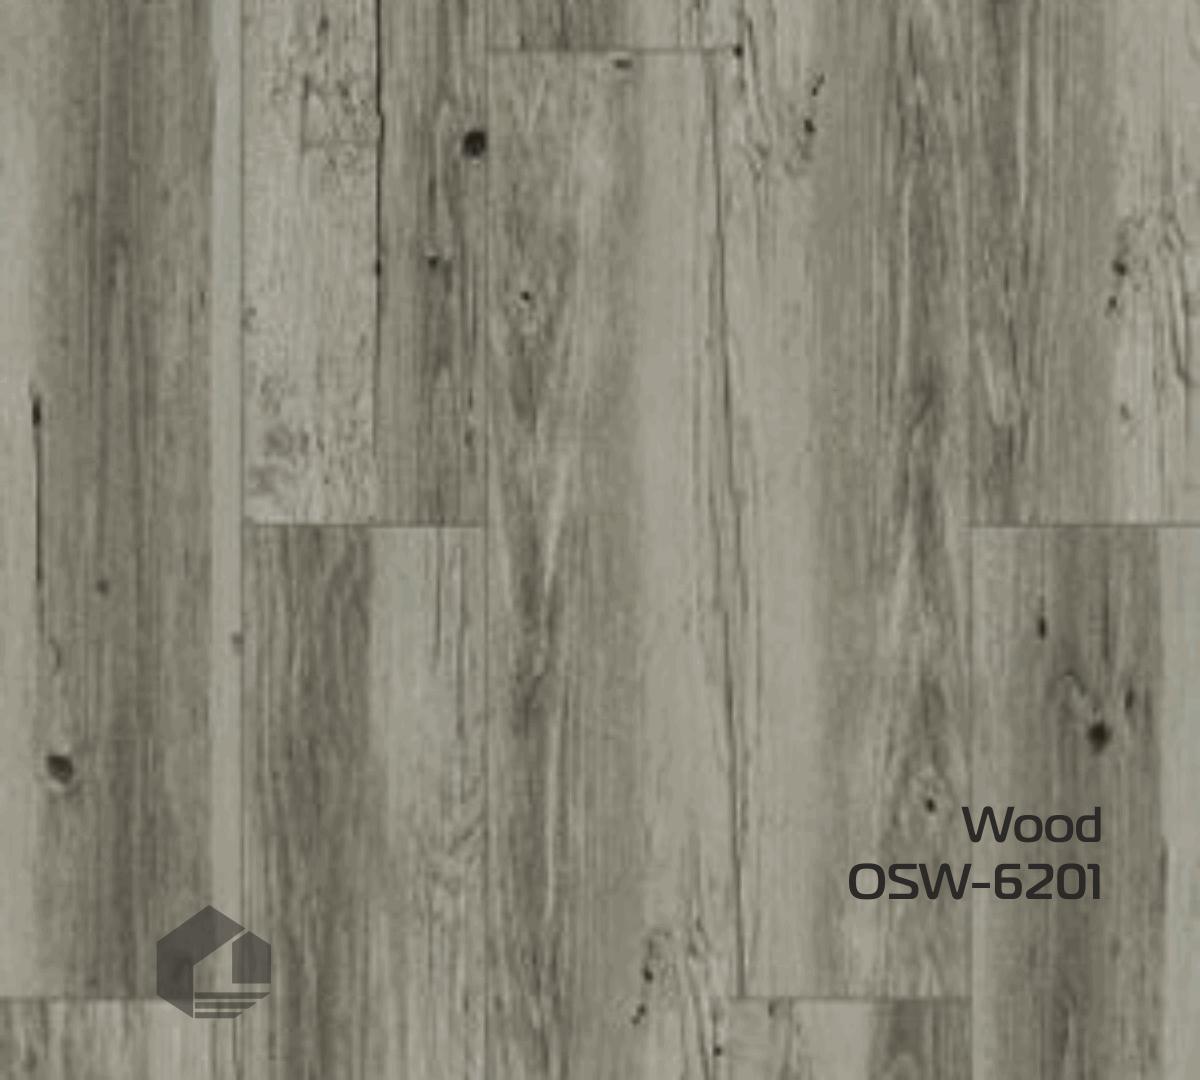 Кварцвиниловая плитка Orchid Tile Wood OSW-6201 (186*940*3 мм.) 19шт/3,32м2